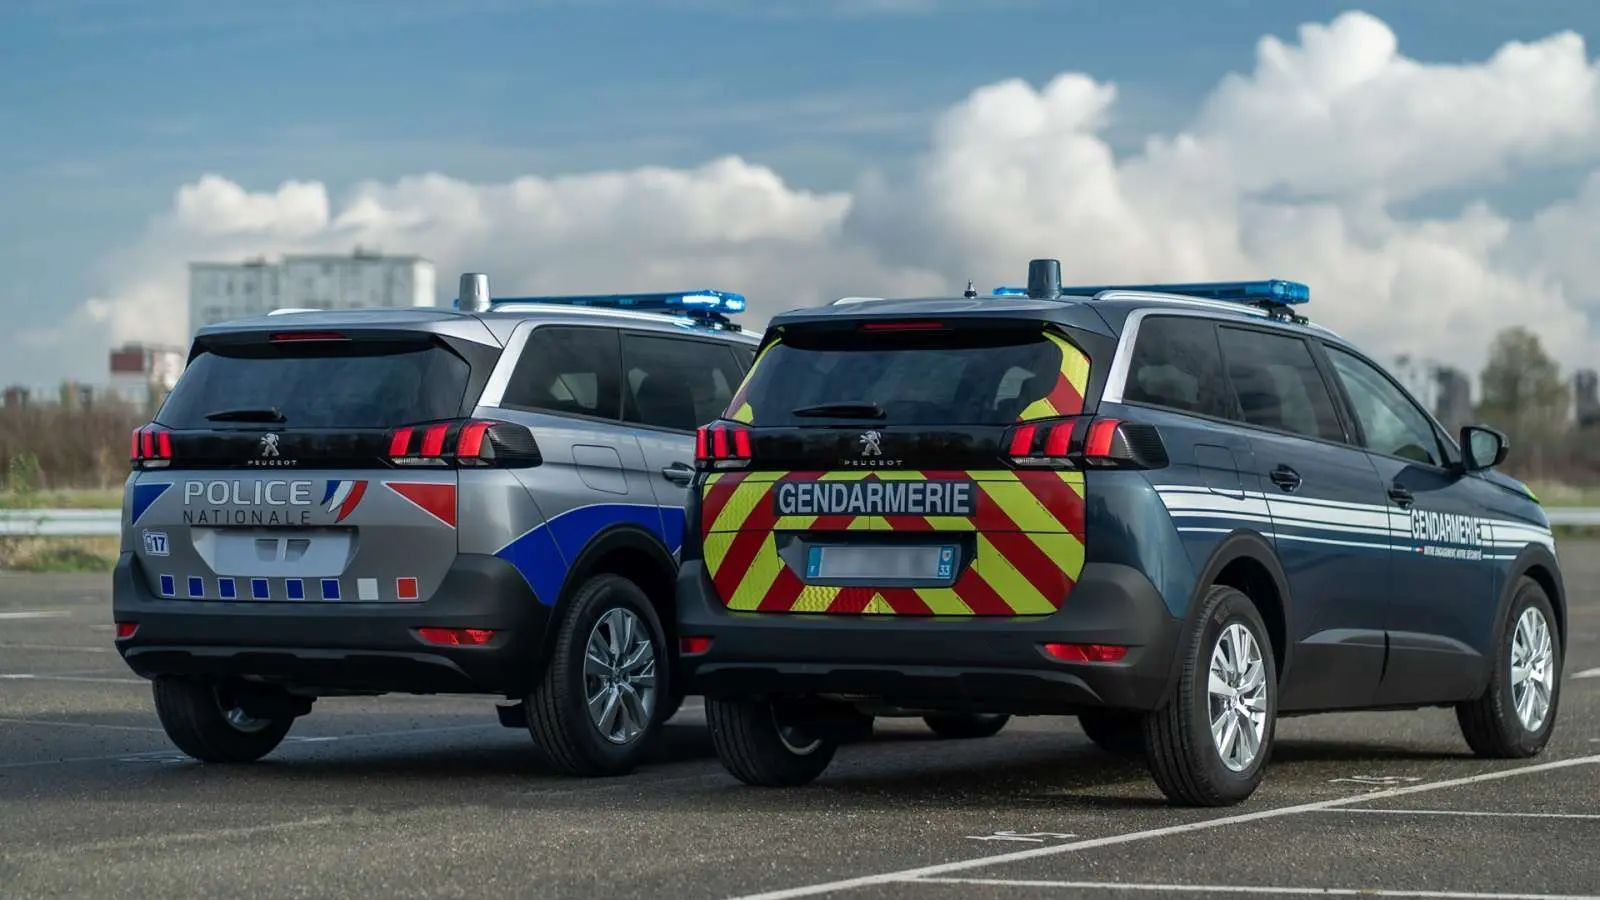 Peugeot 5008 police gendarmerie 19